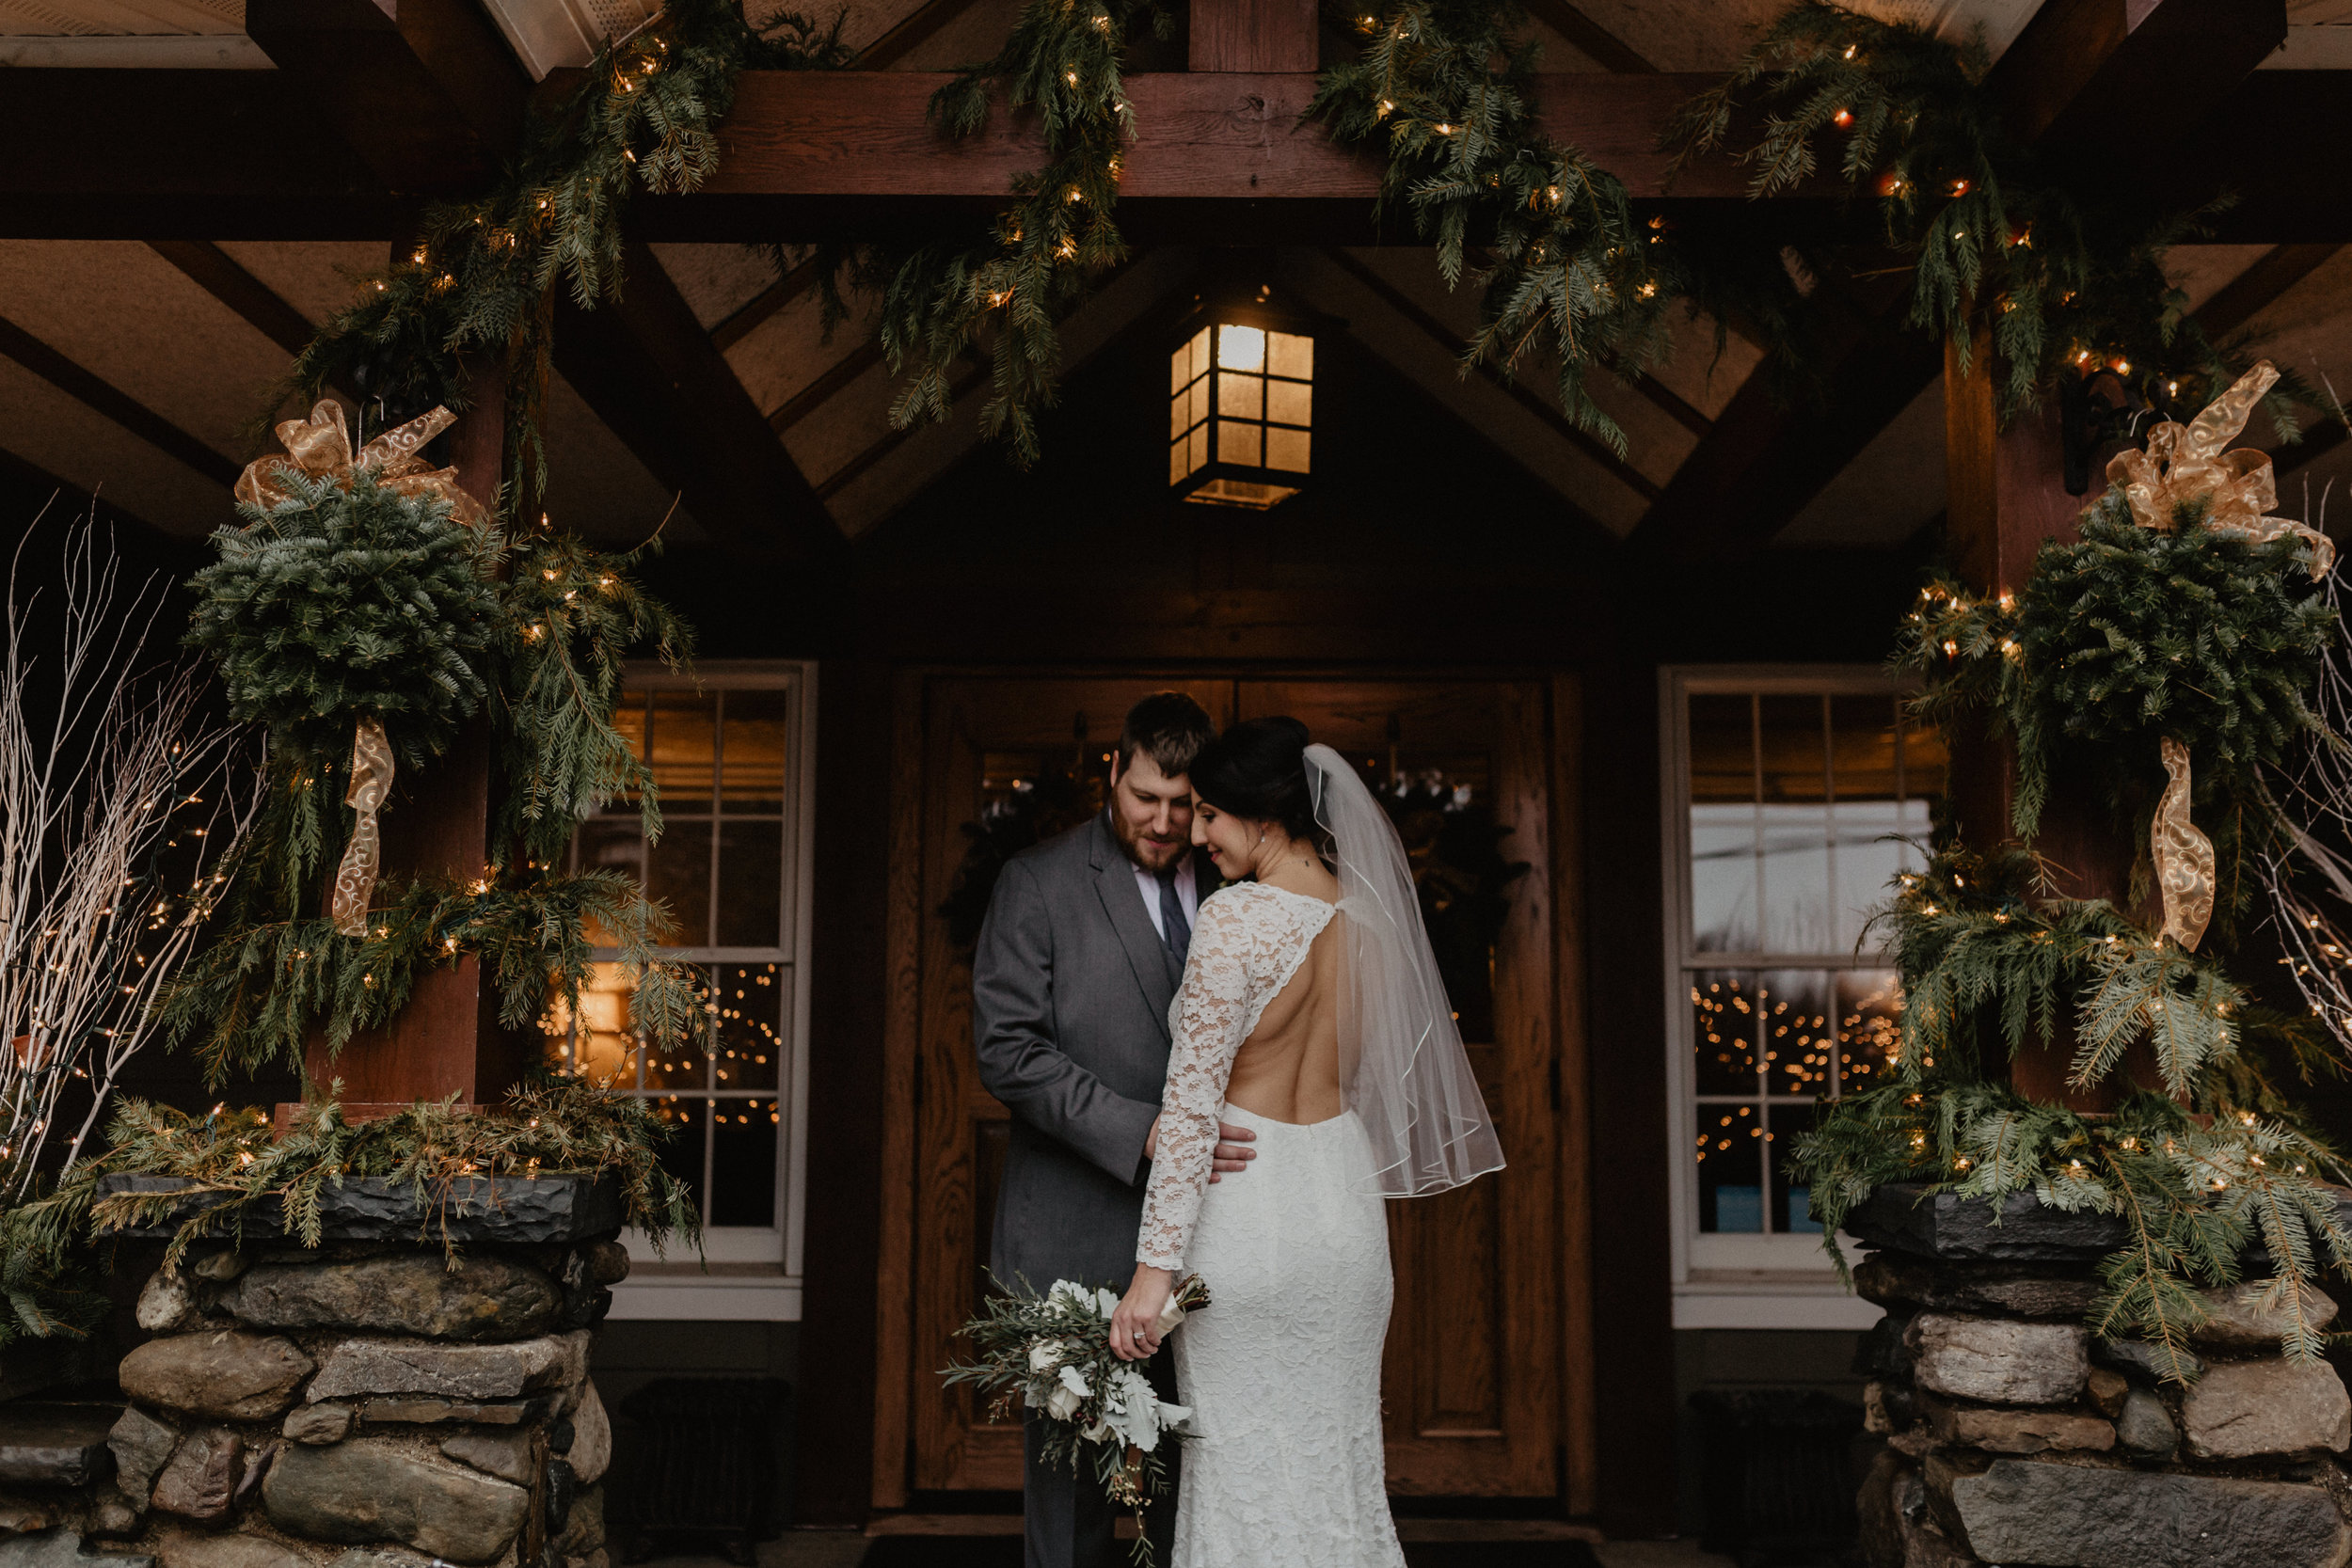 old_daley_on_crooked_lake_wedding_031.jpg